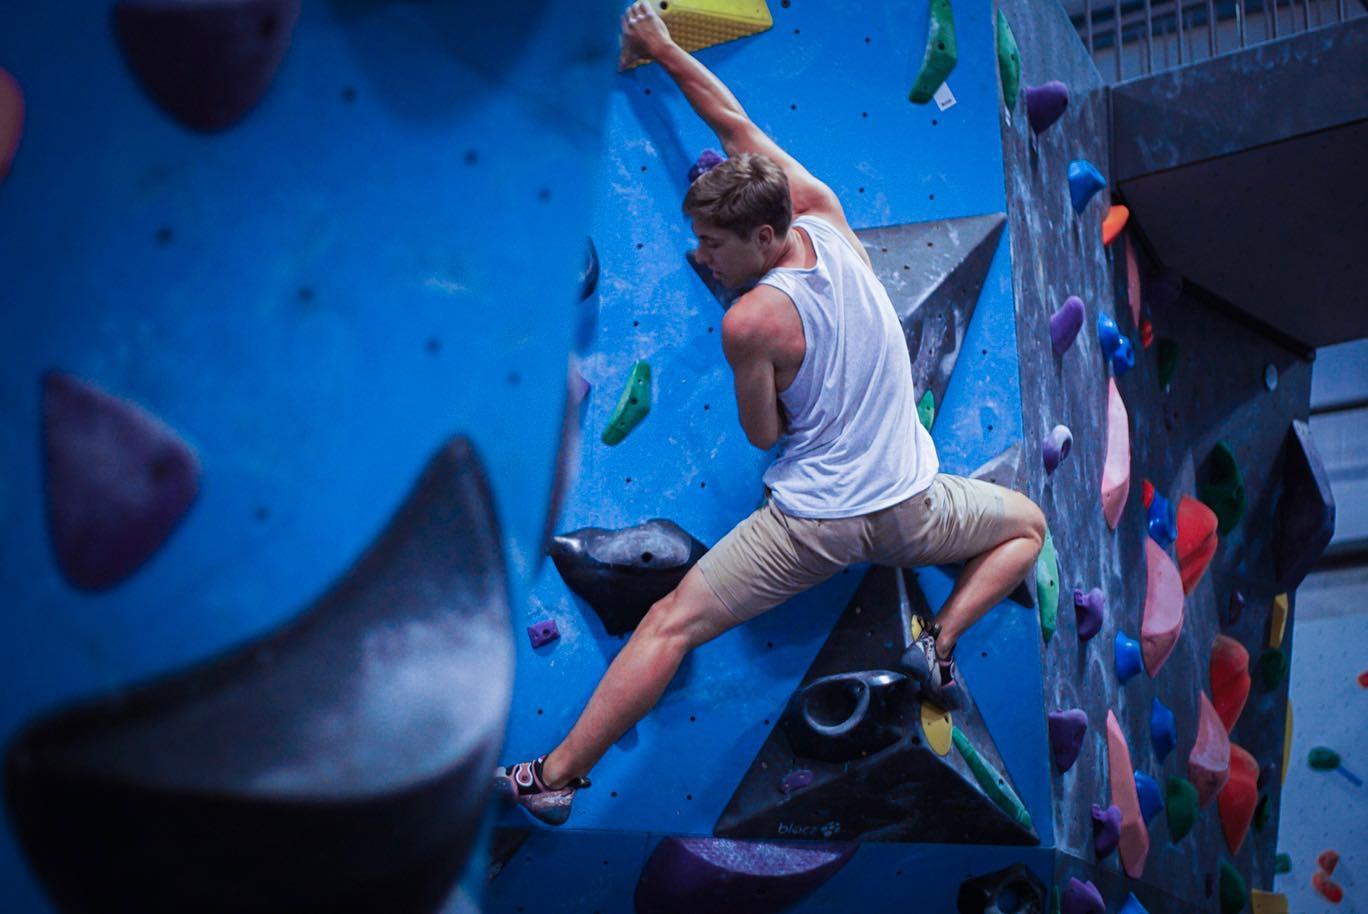 bailey-moro-bouldering.jpg